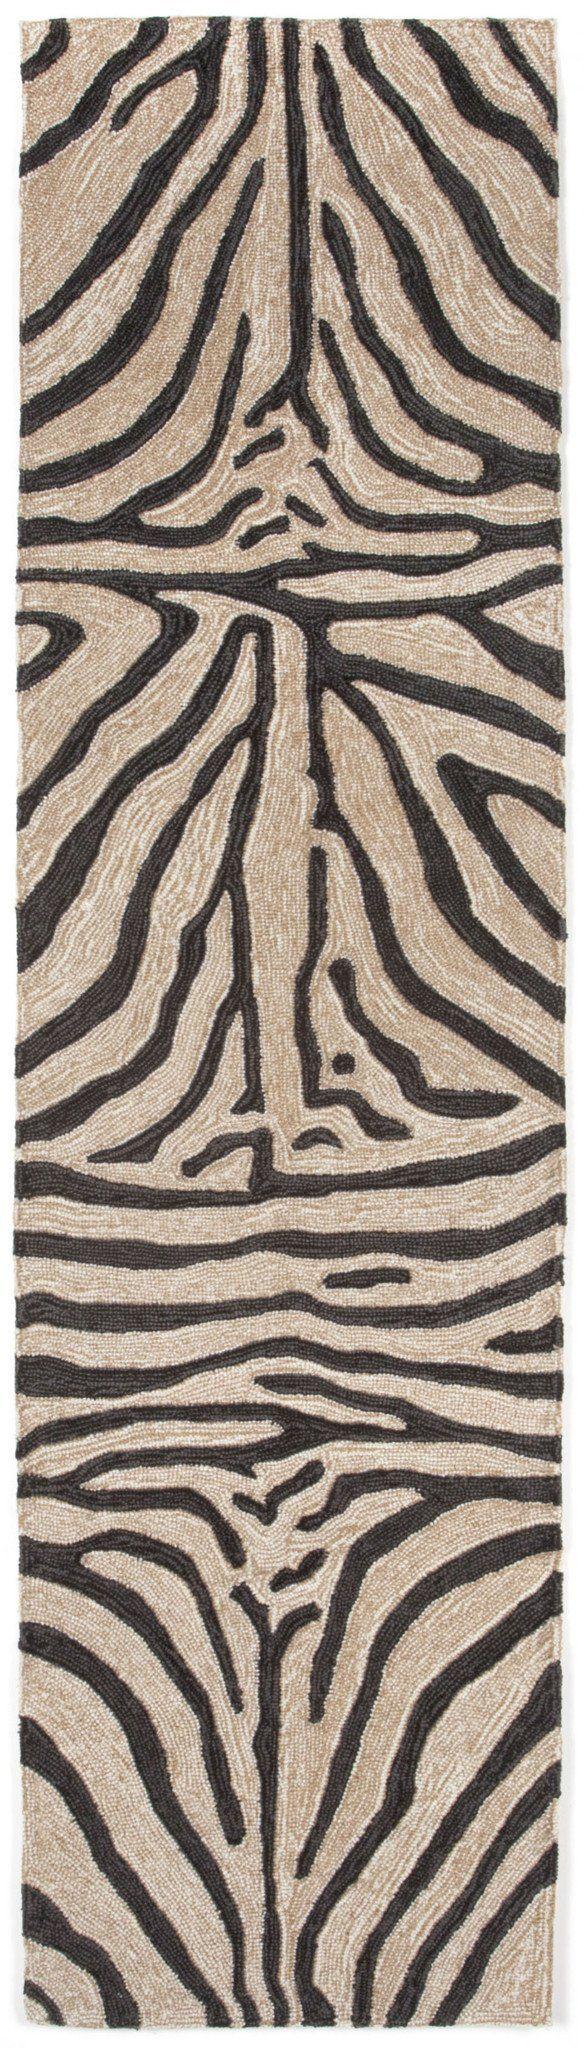 M s de 25 ideas incre bles sobre alfombras de cebra en pinterest decoraci n de habitaci n de - Alfombras de cebra sintetica ...